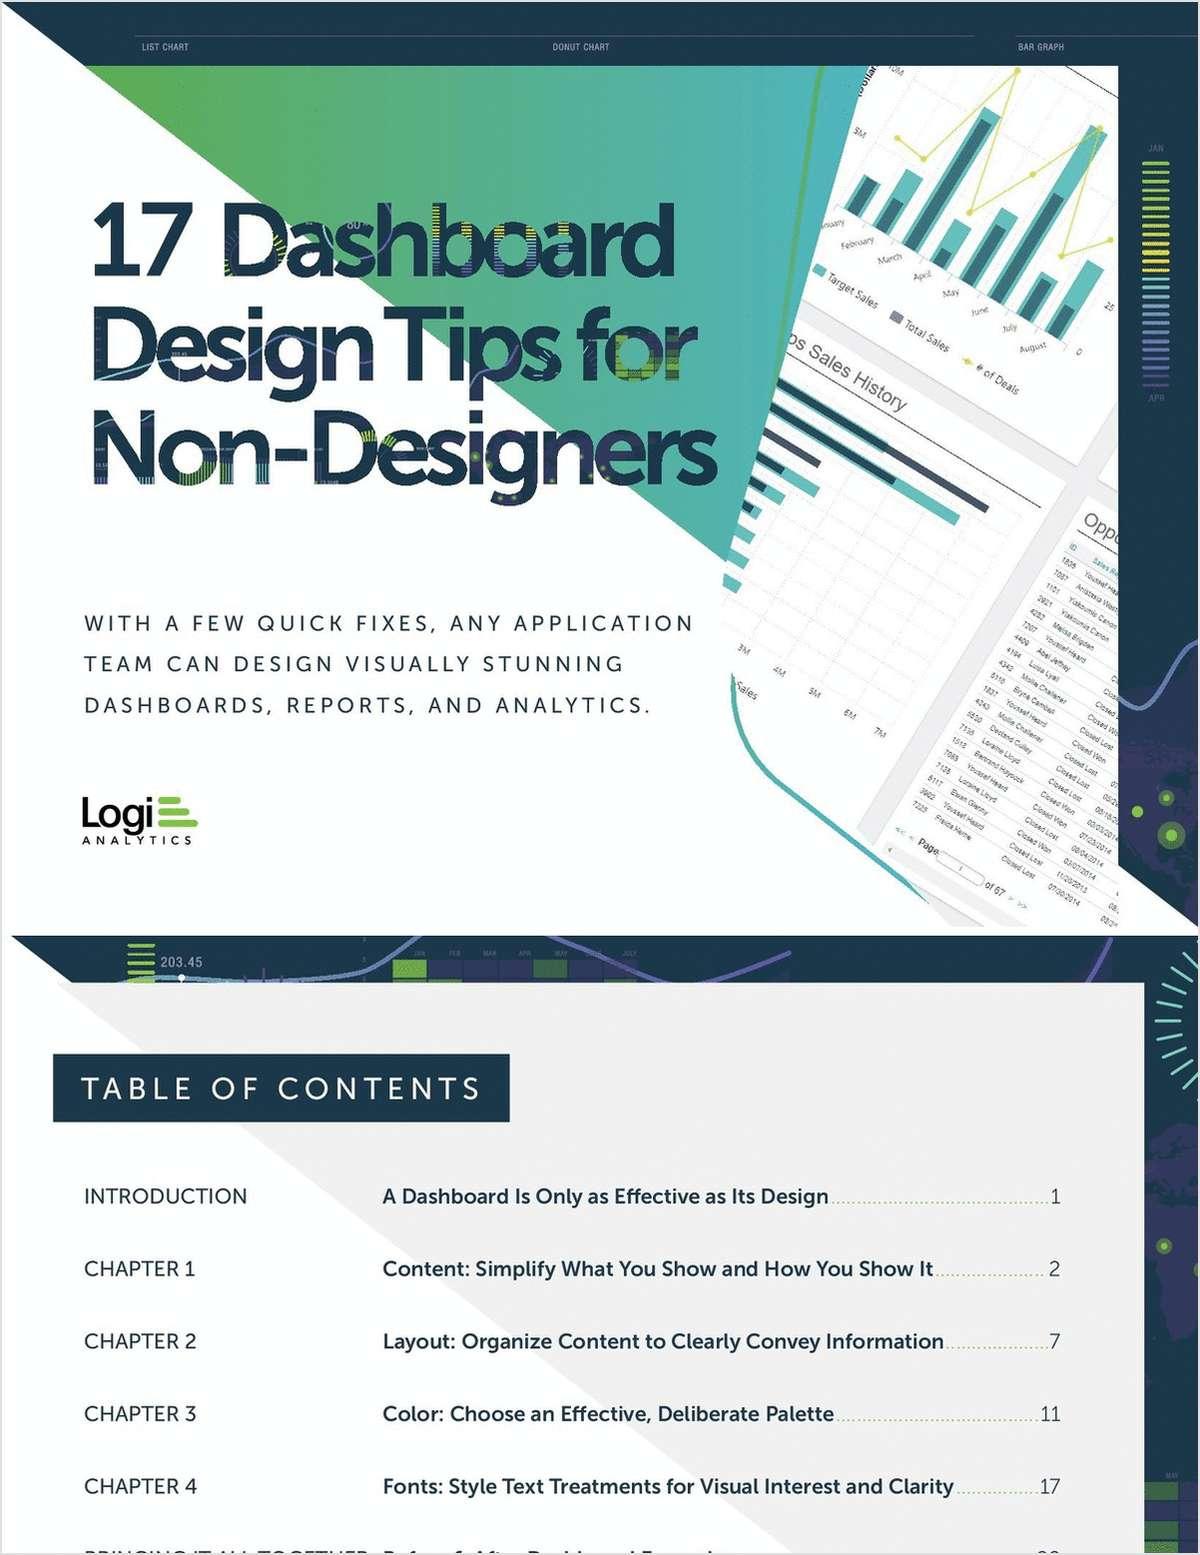 Dashboard Design Tips for Non-Designers